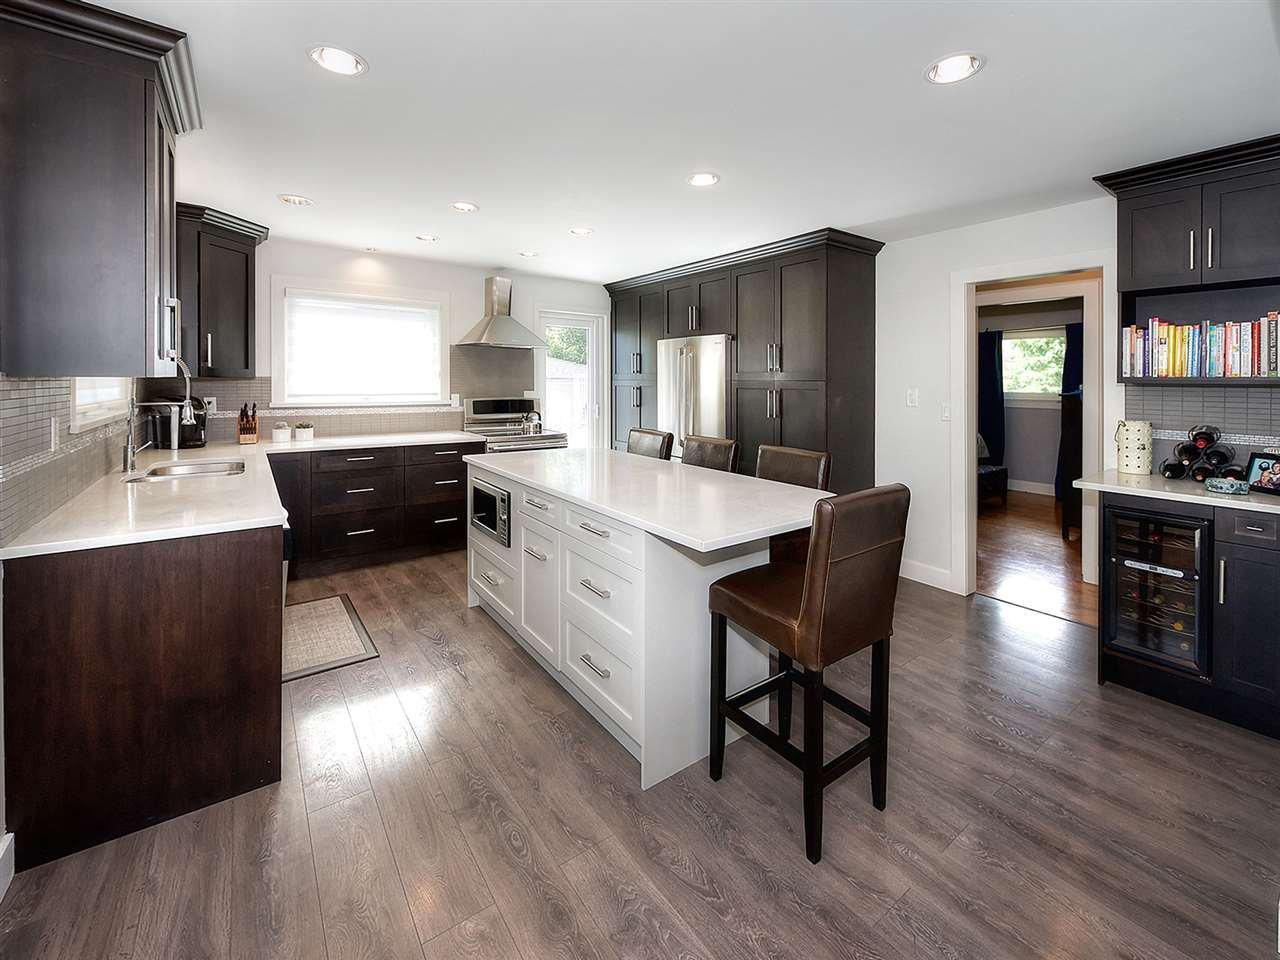 Photo 5: Photos: 1067 WILMINGTON Drive in Delta: Tsawwassen Central House for sale (Tsawwassen)  : MLS®# R2090180